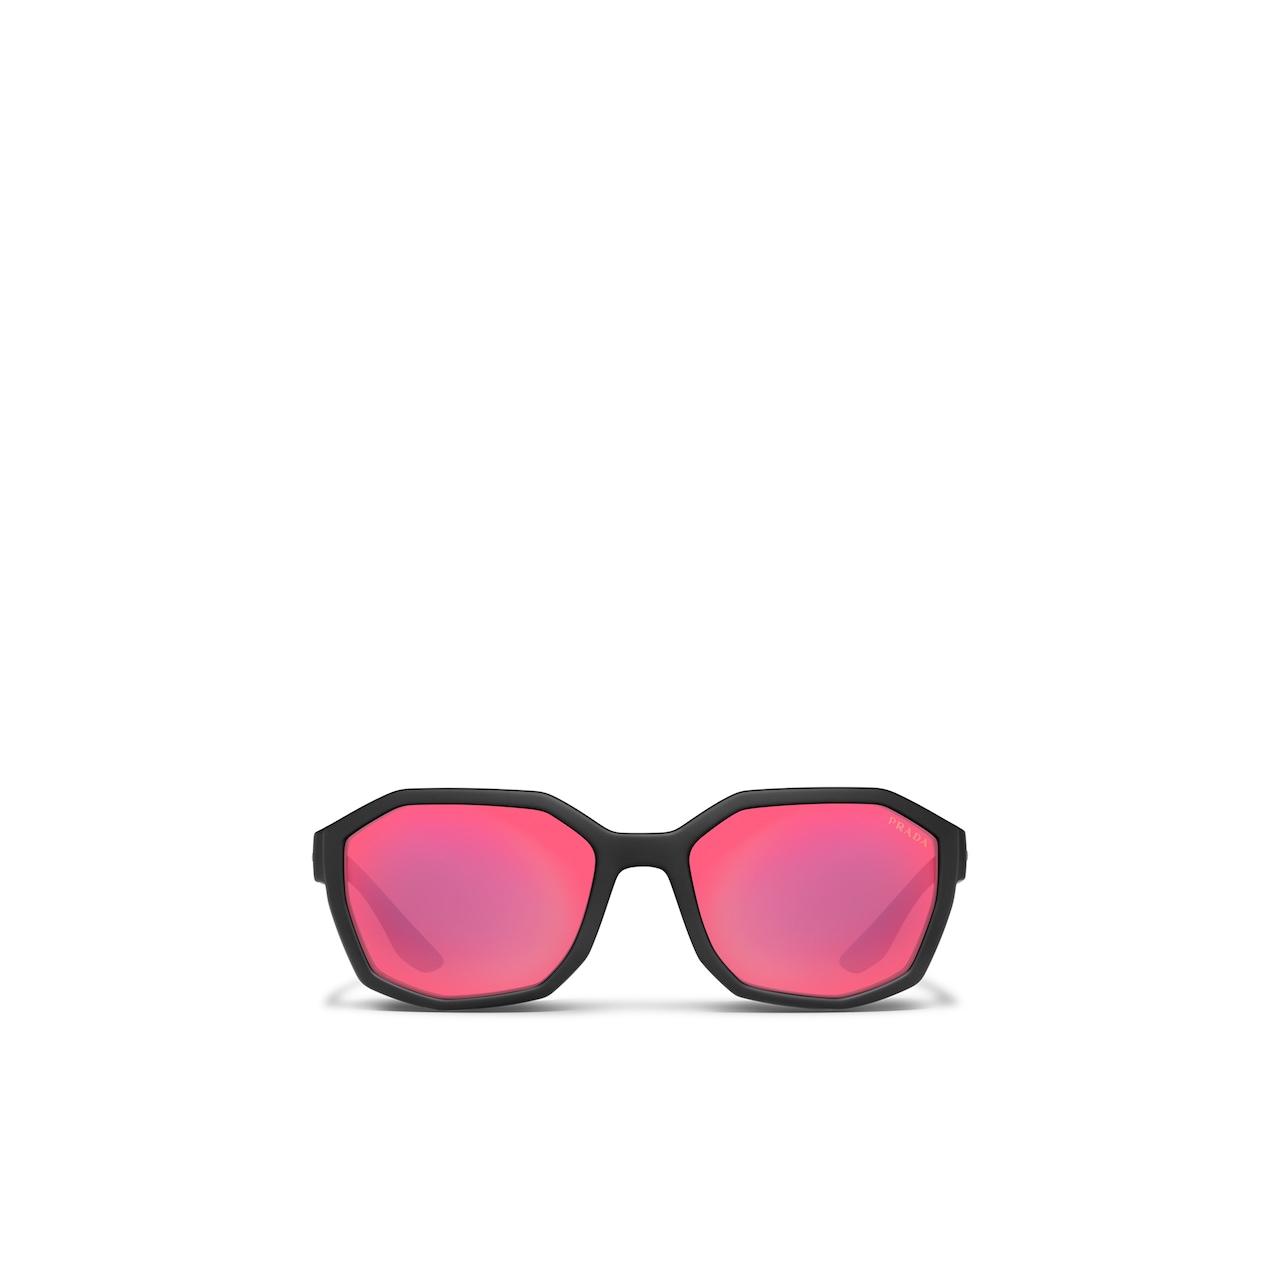 Linea Rossa Eyewear Collection sunglasses